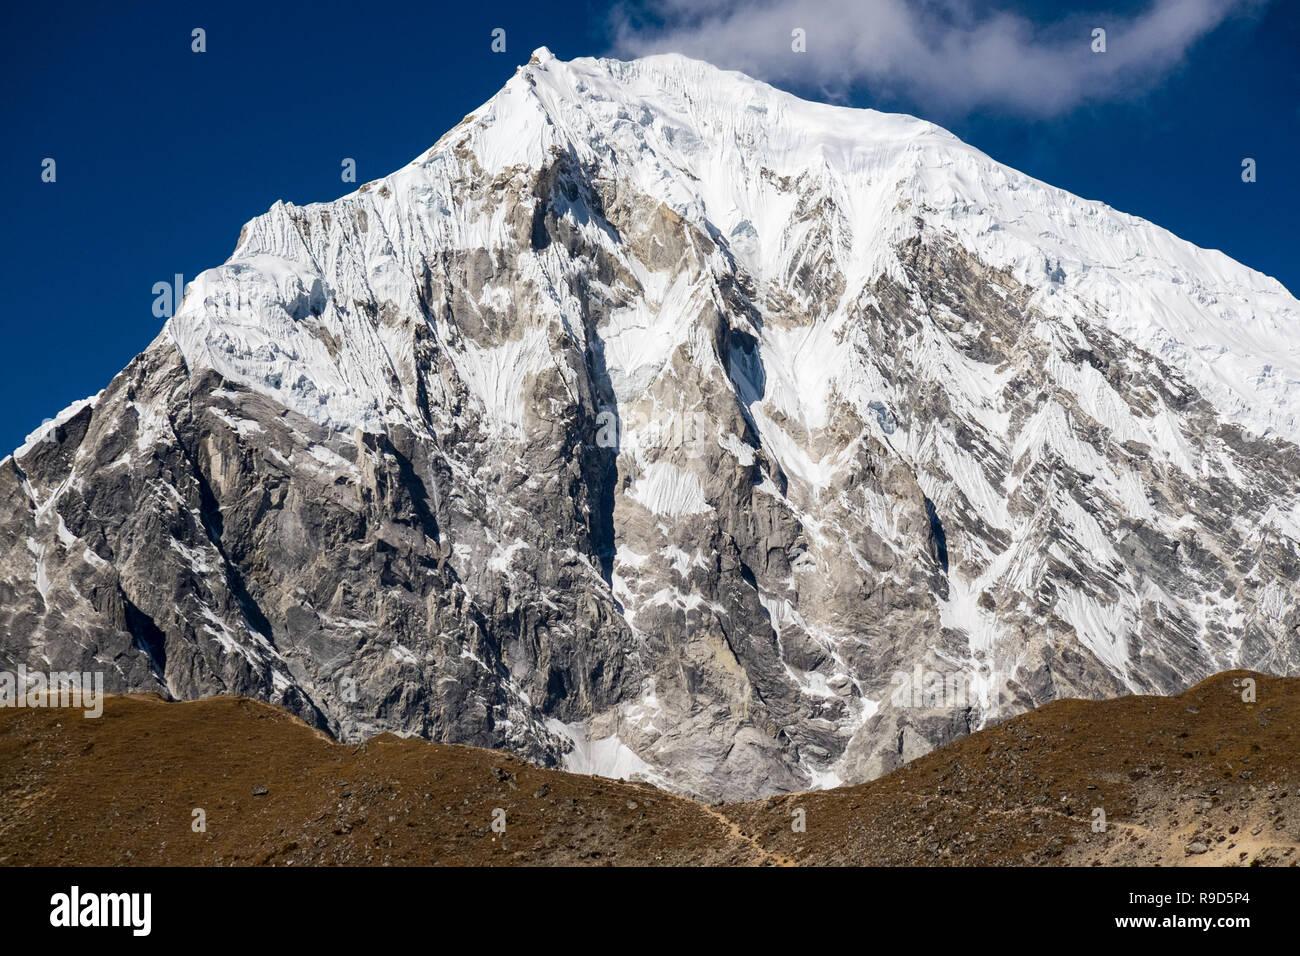 The Langtang Himalayas and the popular viewpoint of Kyanjin Ri, Nepal - Stock Image